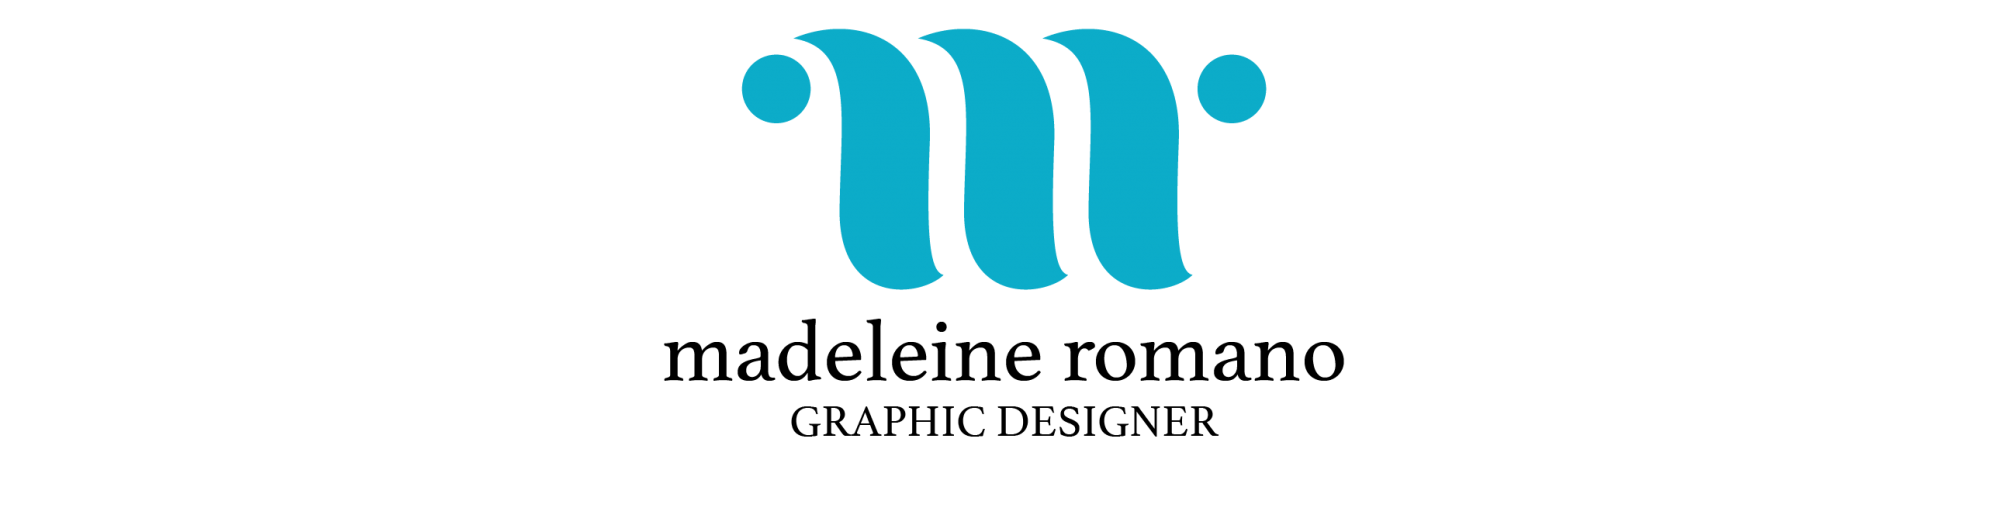 madeleine romano